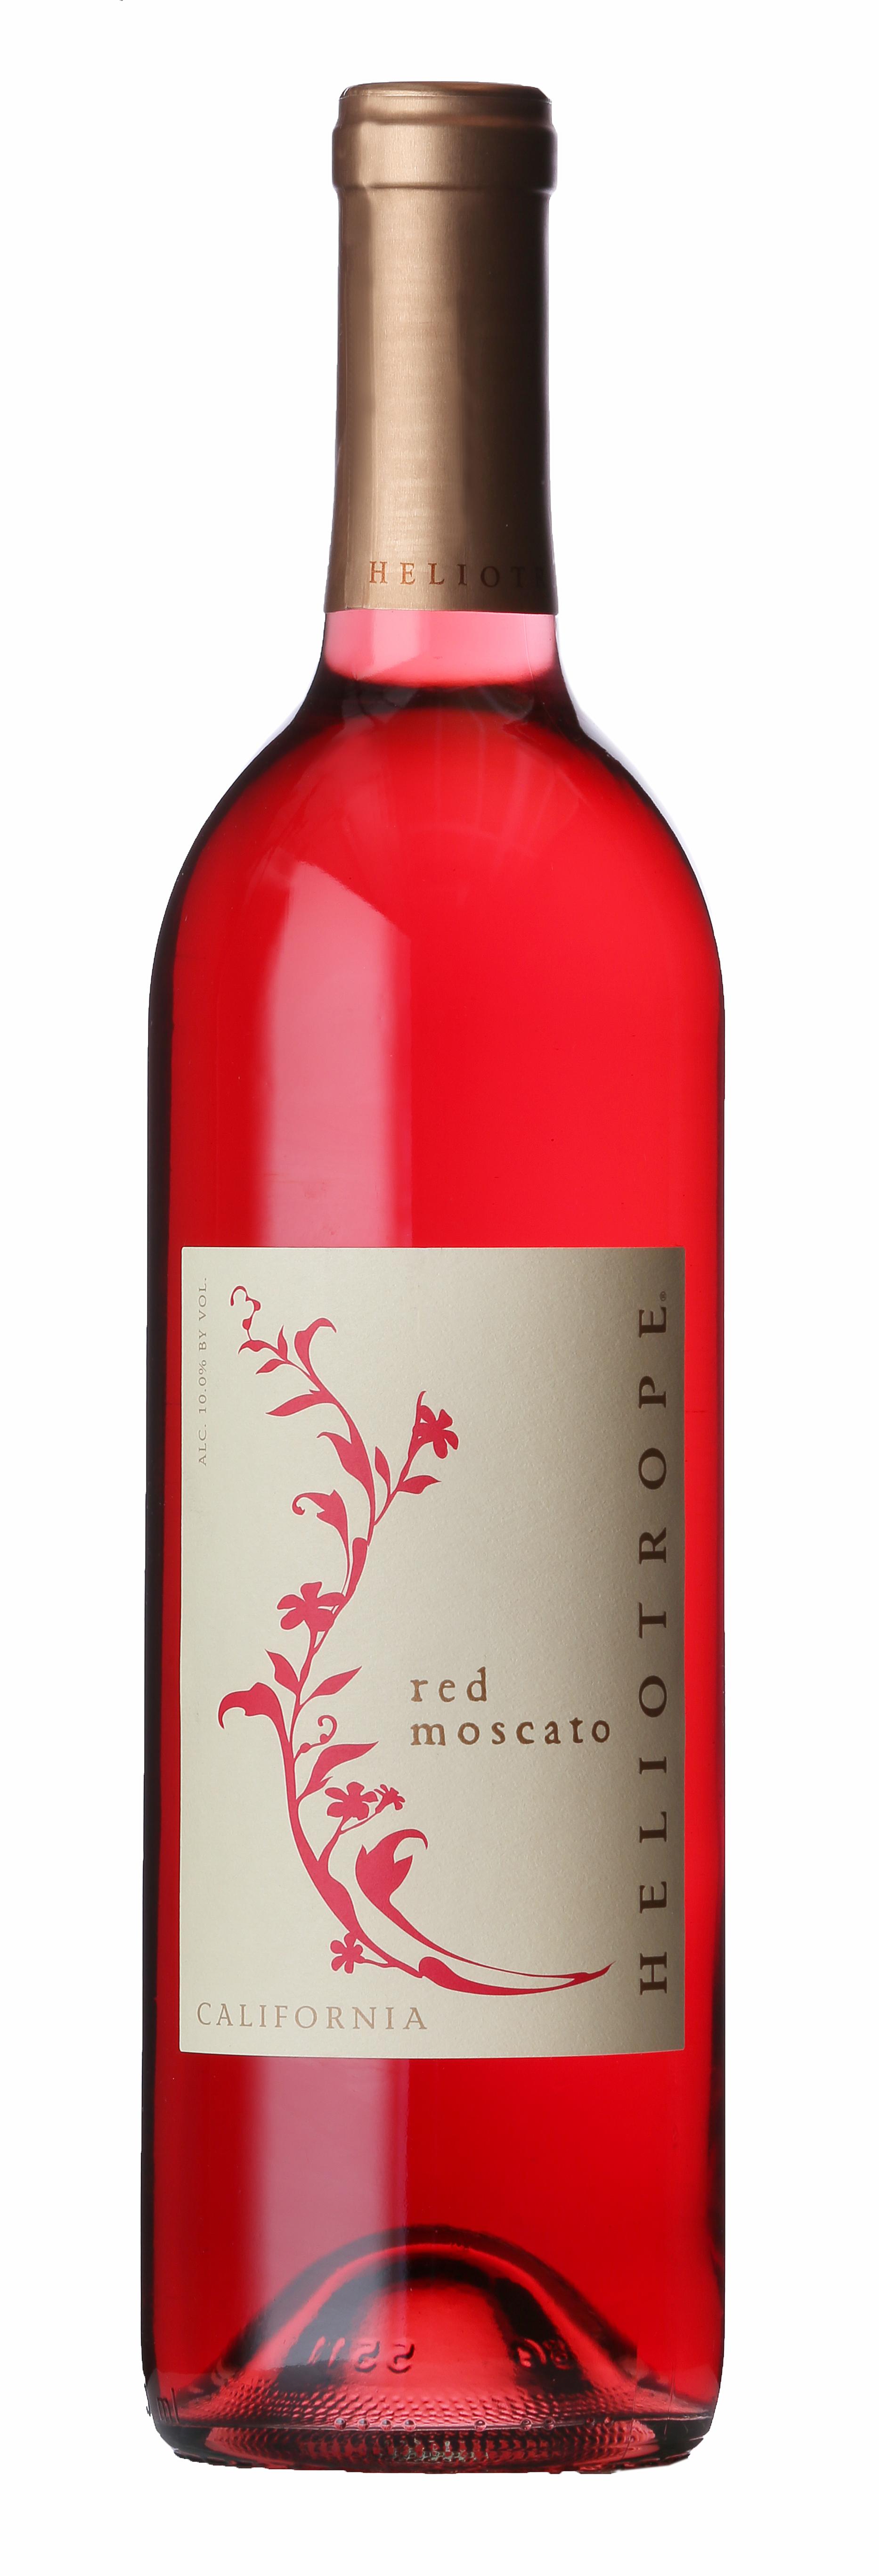 Heliotrope_RedMoscato_bottle.jpg